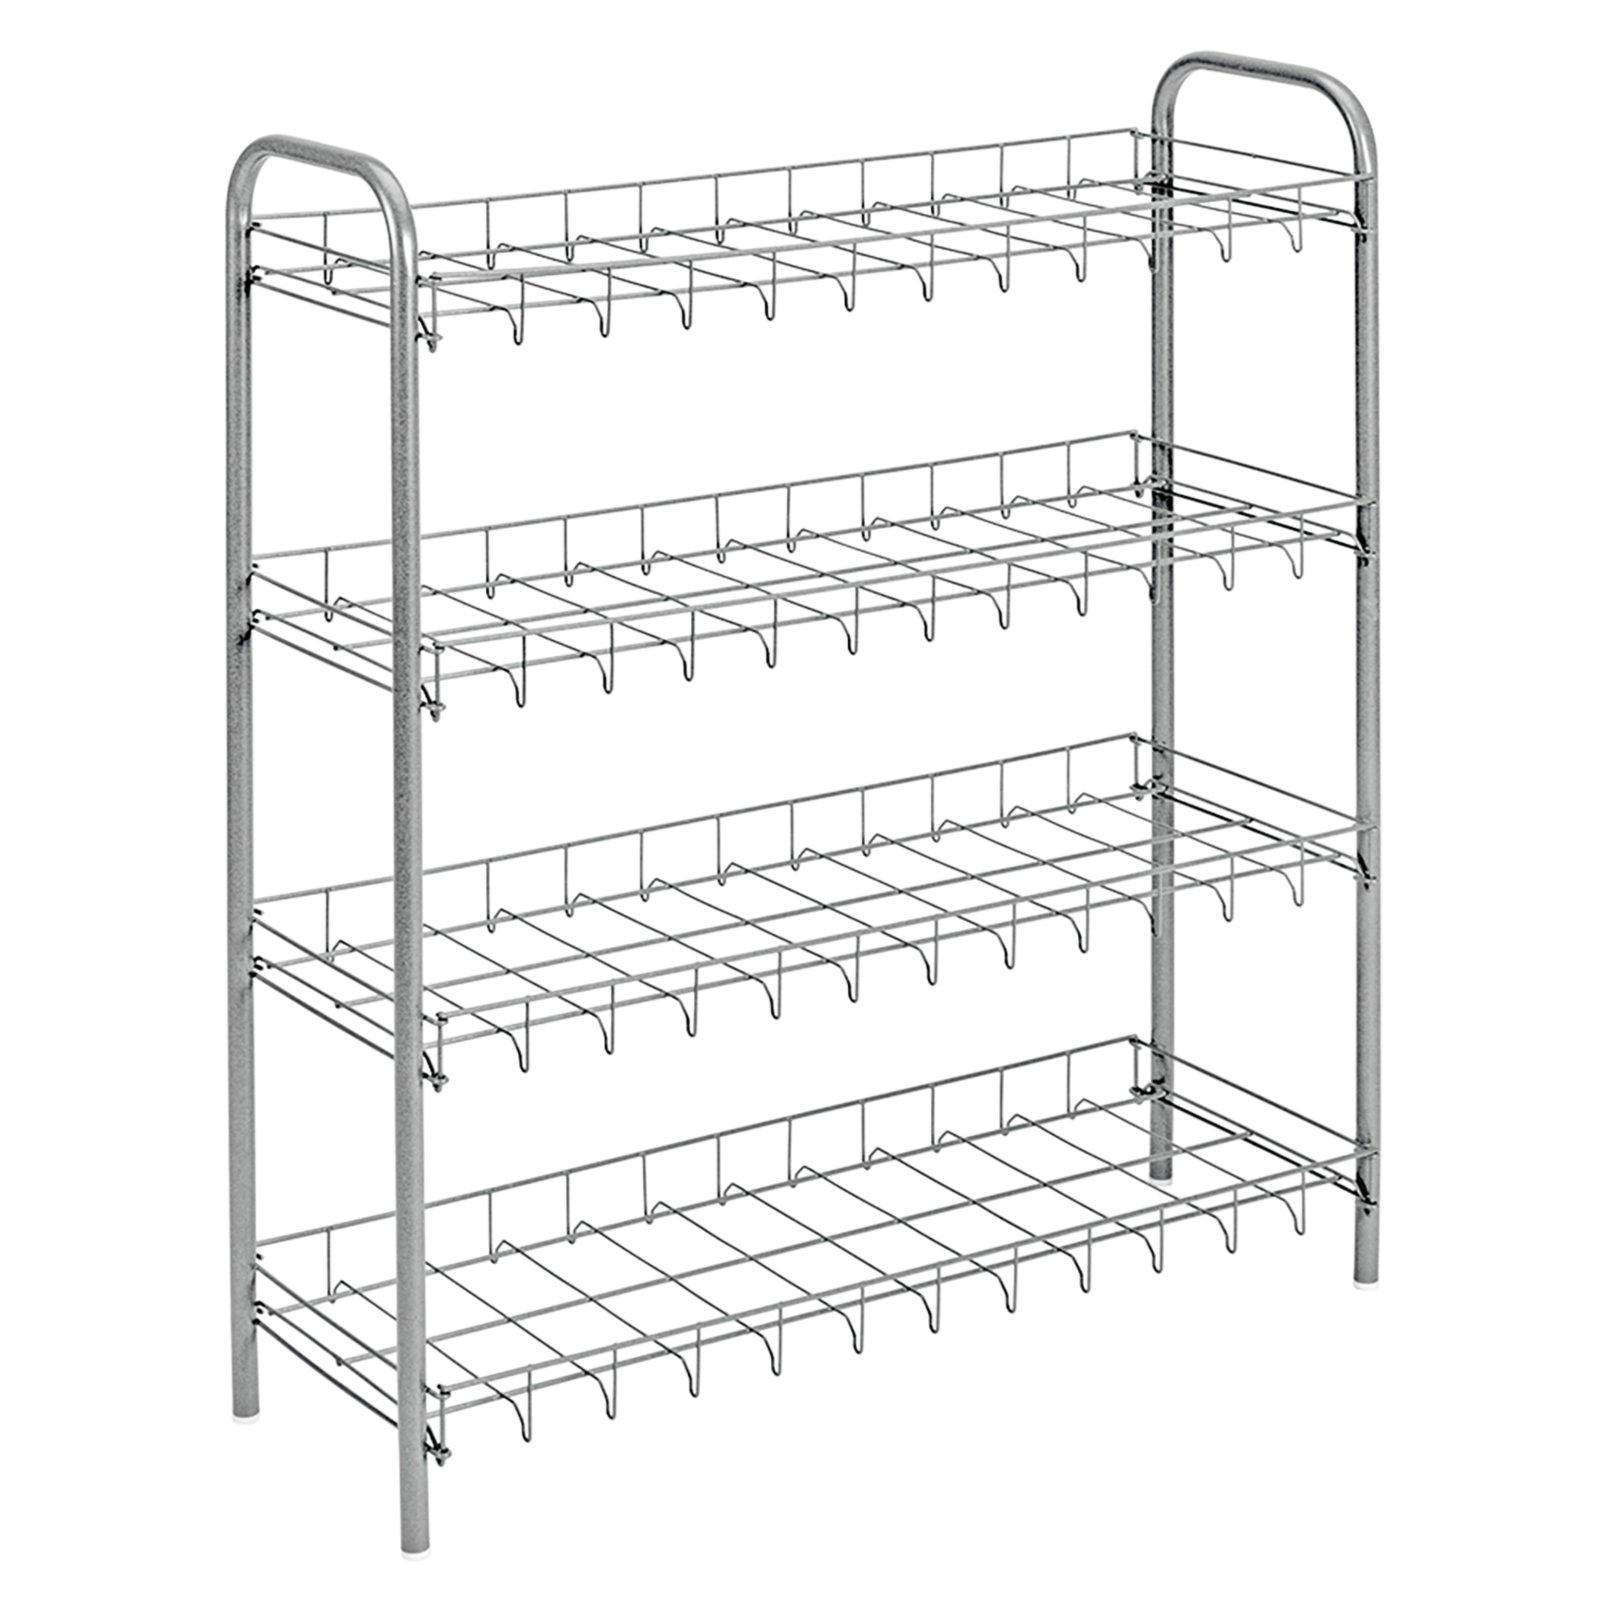 roller schuhregal metall verchromt 4 etagen ebay. Black Bedroom Furniture Sets. Home Design Ideas